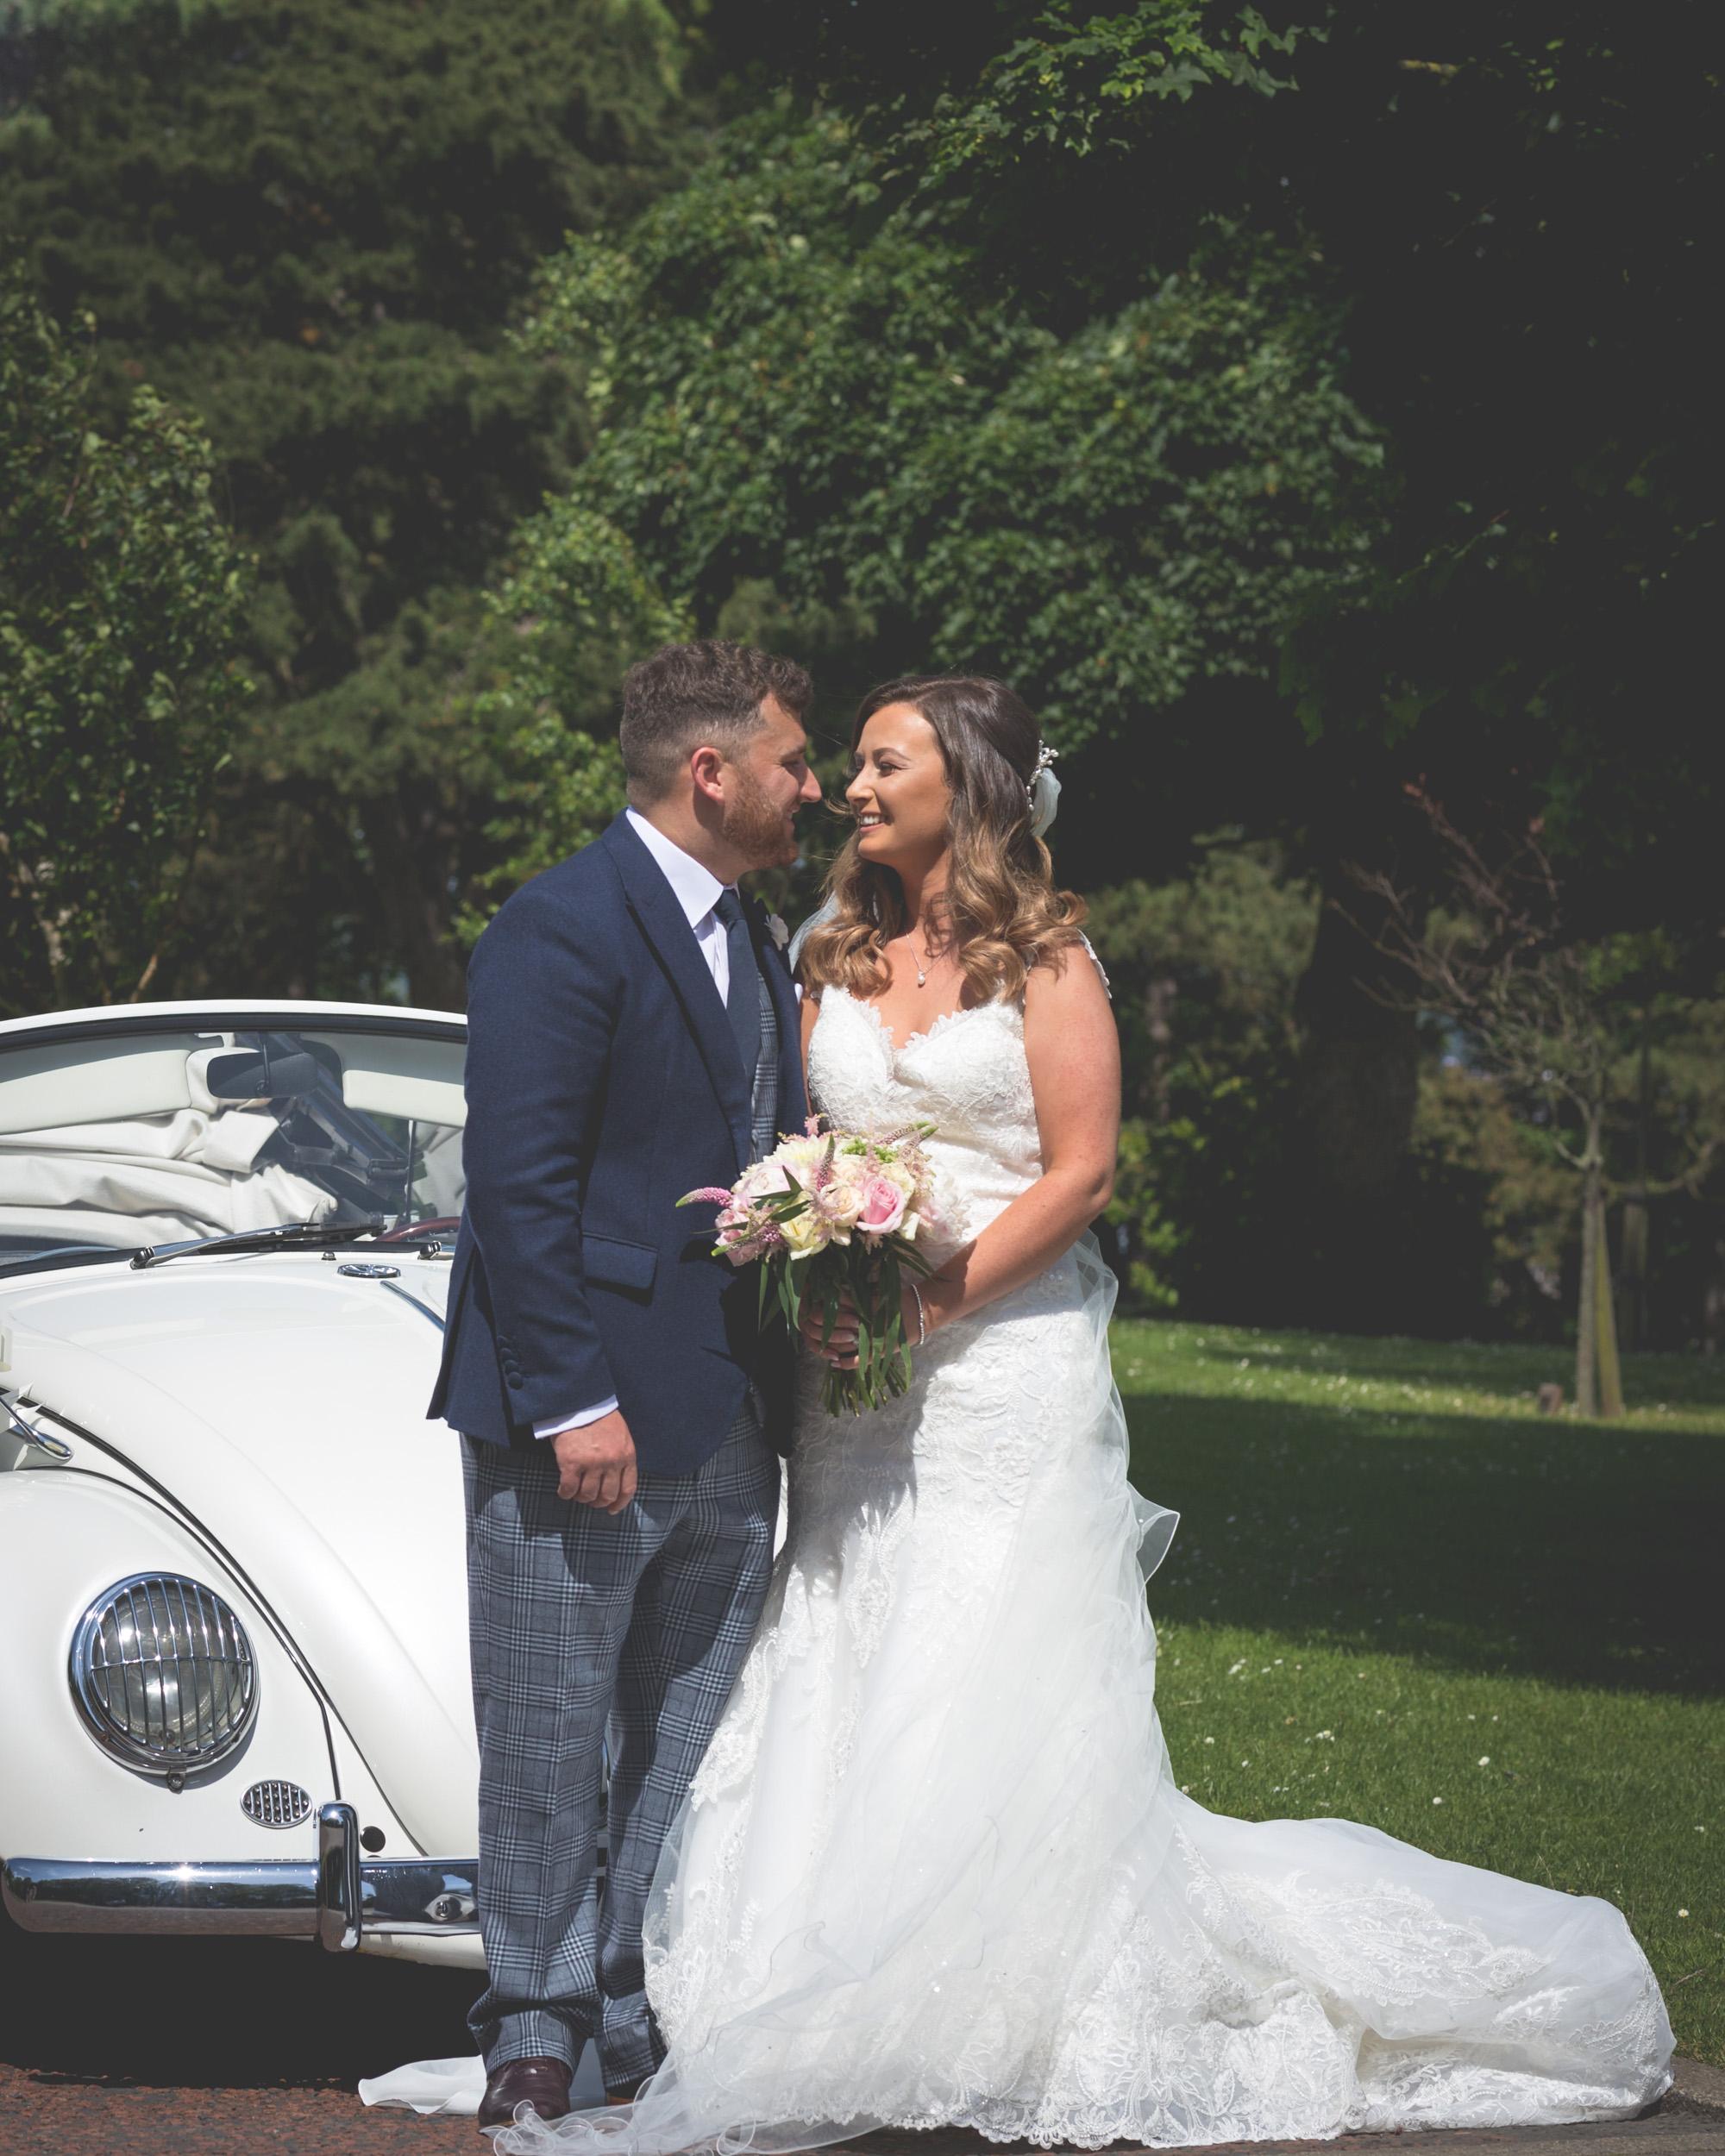 Brian McEwan   Northern Ireland Wedding Photographer   Rebecca & Michael   Portraits-17.jpg